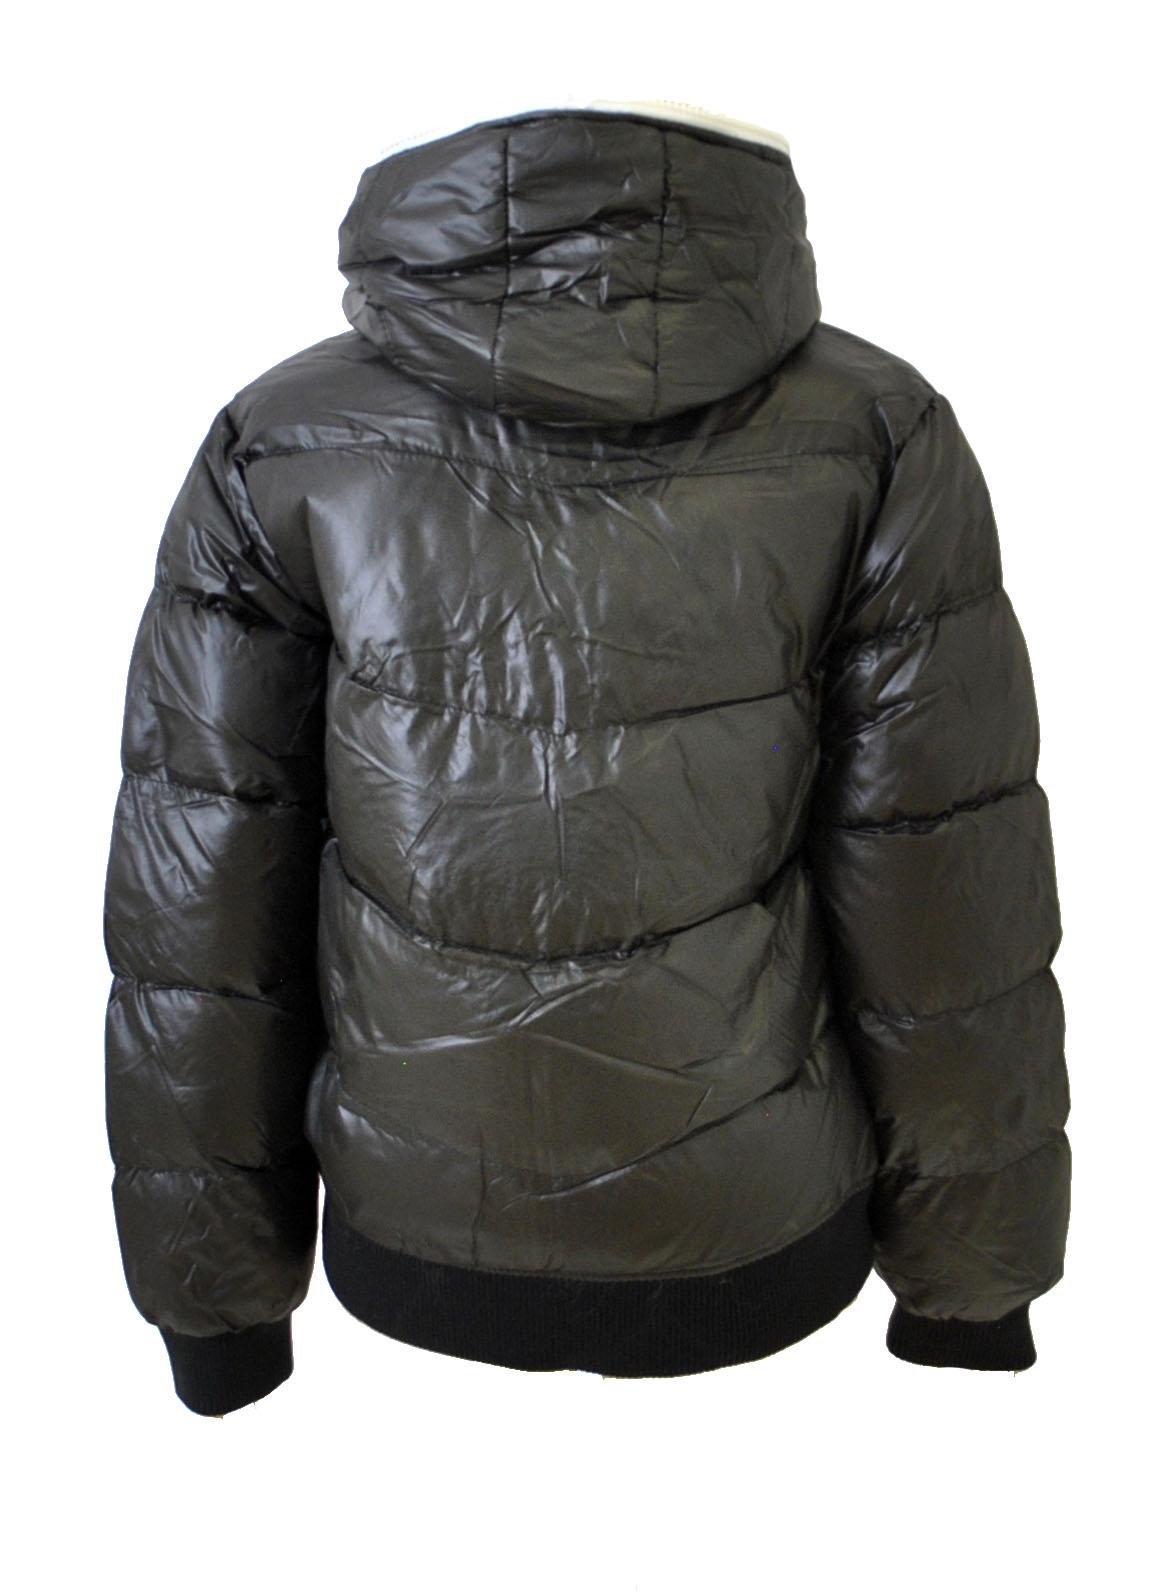 Boys Black Hooded Bubble Jacket